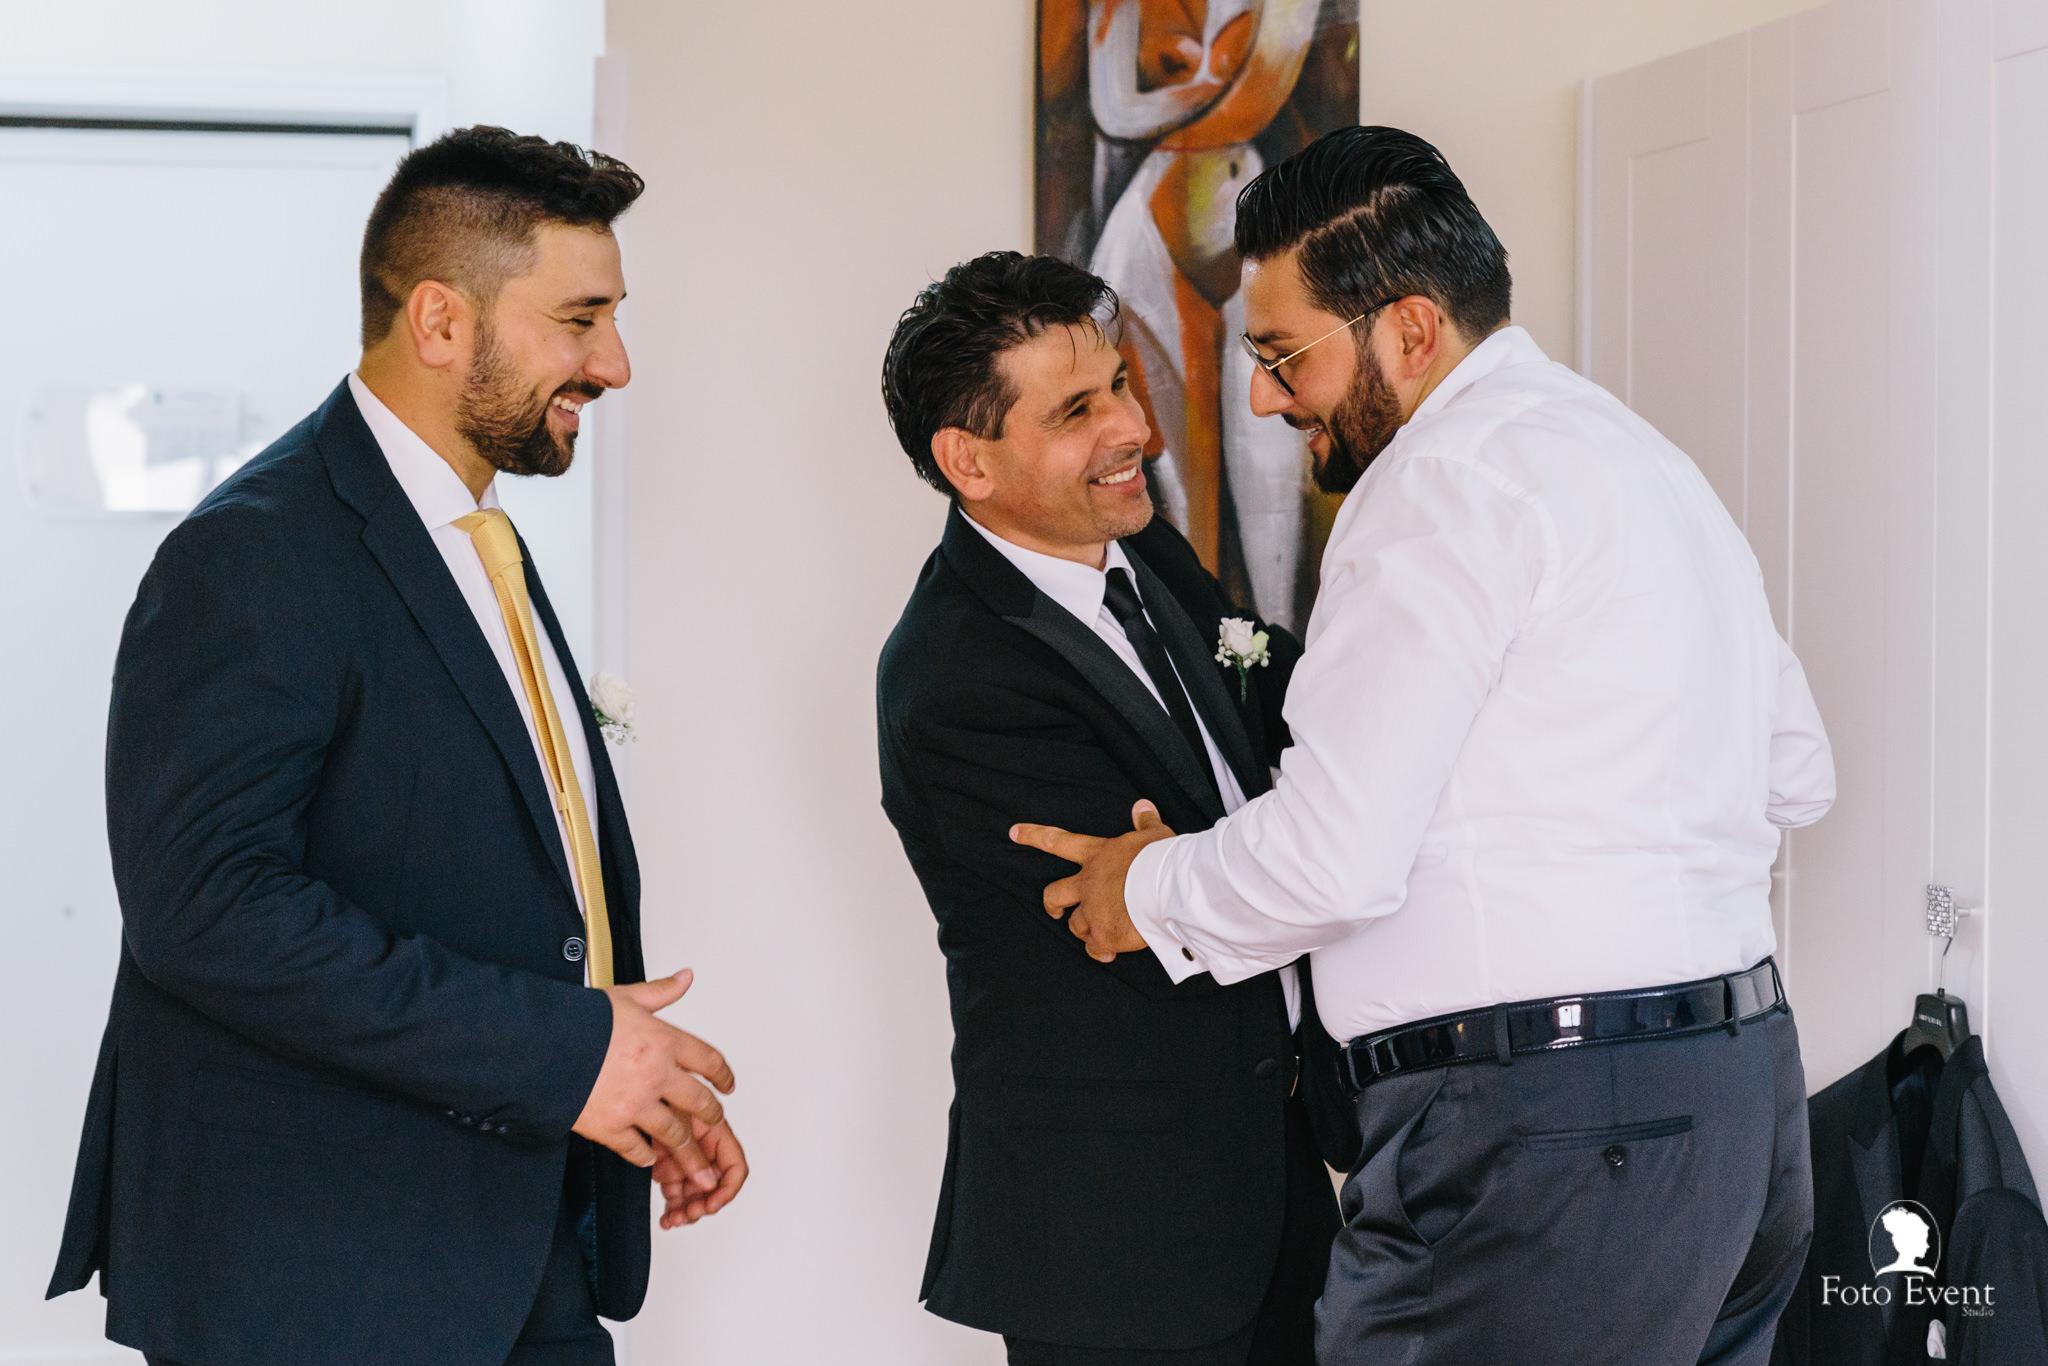 003-2019-09-09-Matrimonio-Dorotea-e-Alberto-Iemmolo-5DN-053